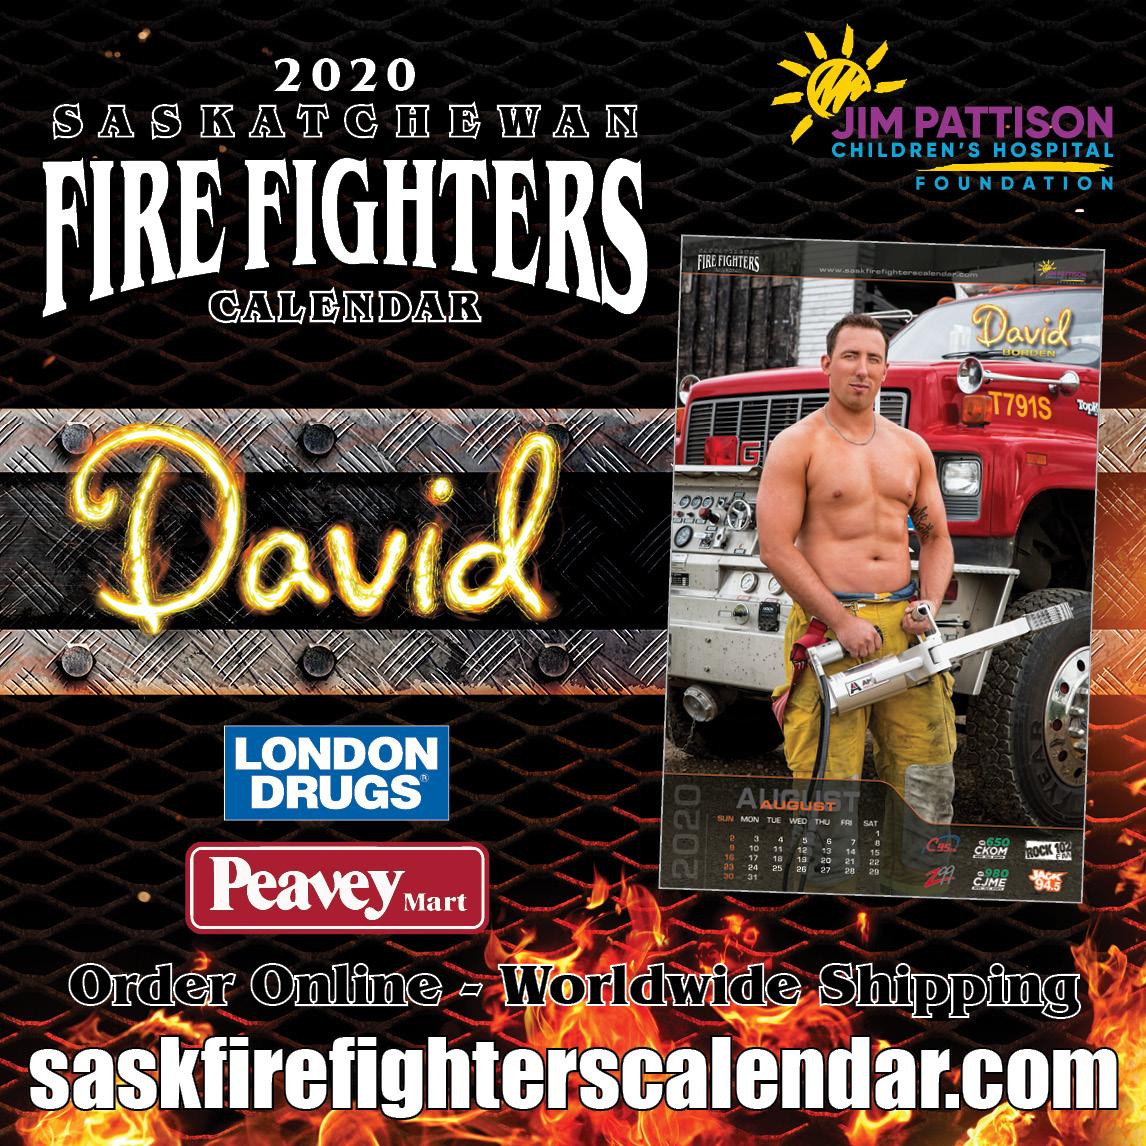 Mr. August is Fire Fighter David on the 2020 Saskatchewan Fire Fighters Calendar. Get your calendar locally around the province or online today. All proceeds to Jim Pattison Children's Hospital Foundation.  #yqr #yxe #sask #sk #regina #saskatoon #weyburn #moosejaw #princealbertpic.twitter.com/tpM6oxVlbT